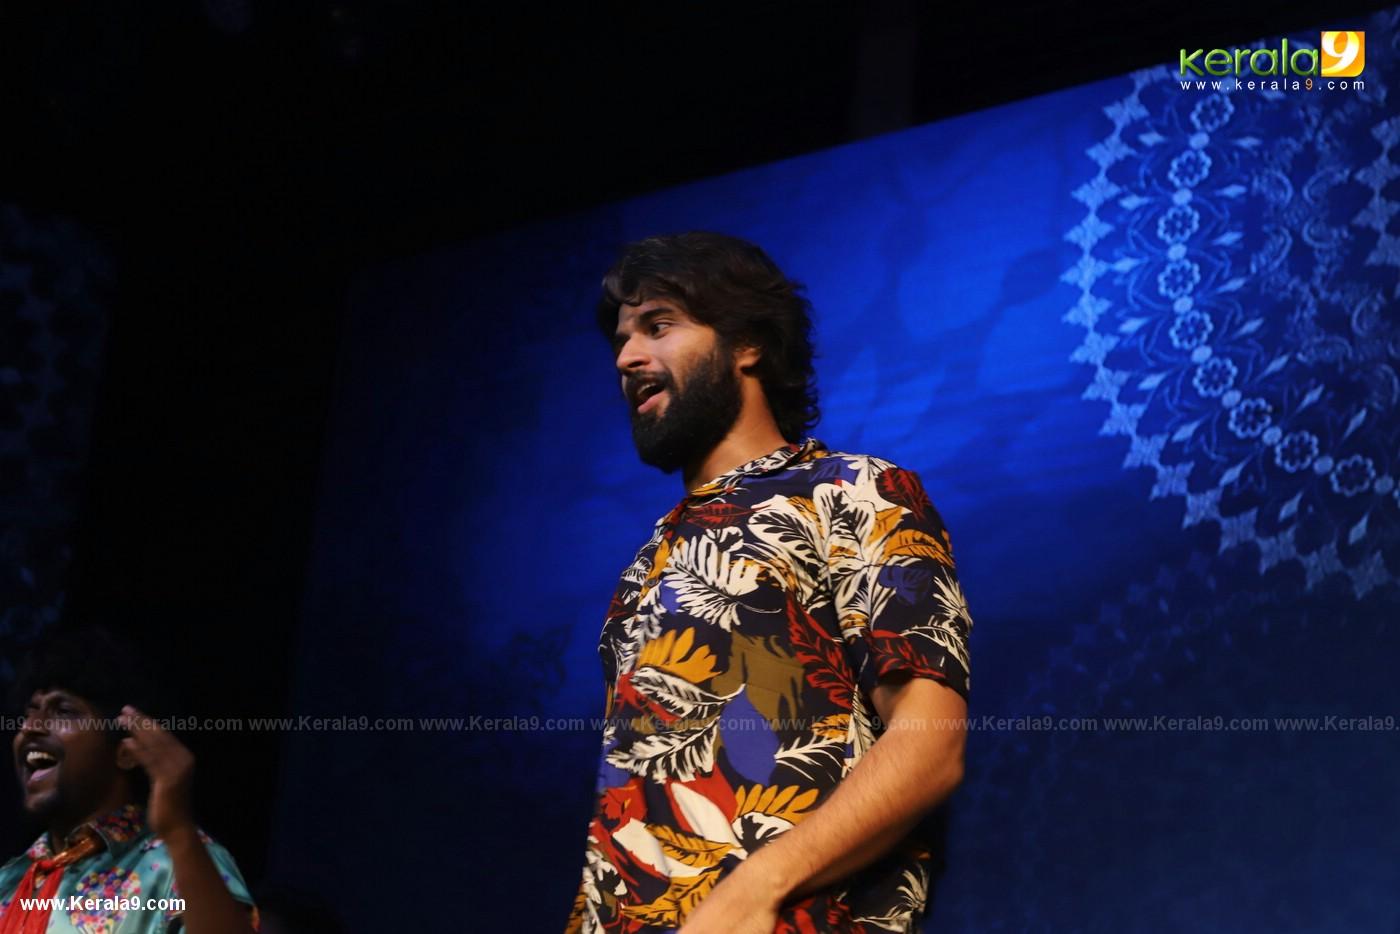 Dear Comrade movie premotion kerala kochi photos 069 - Kerala9.com